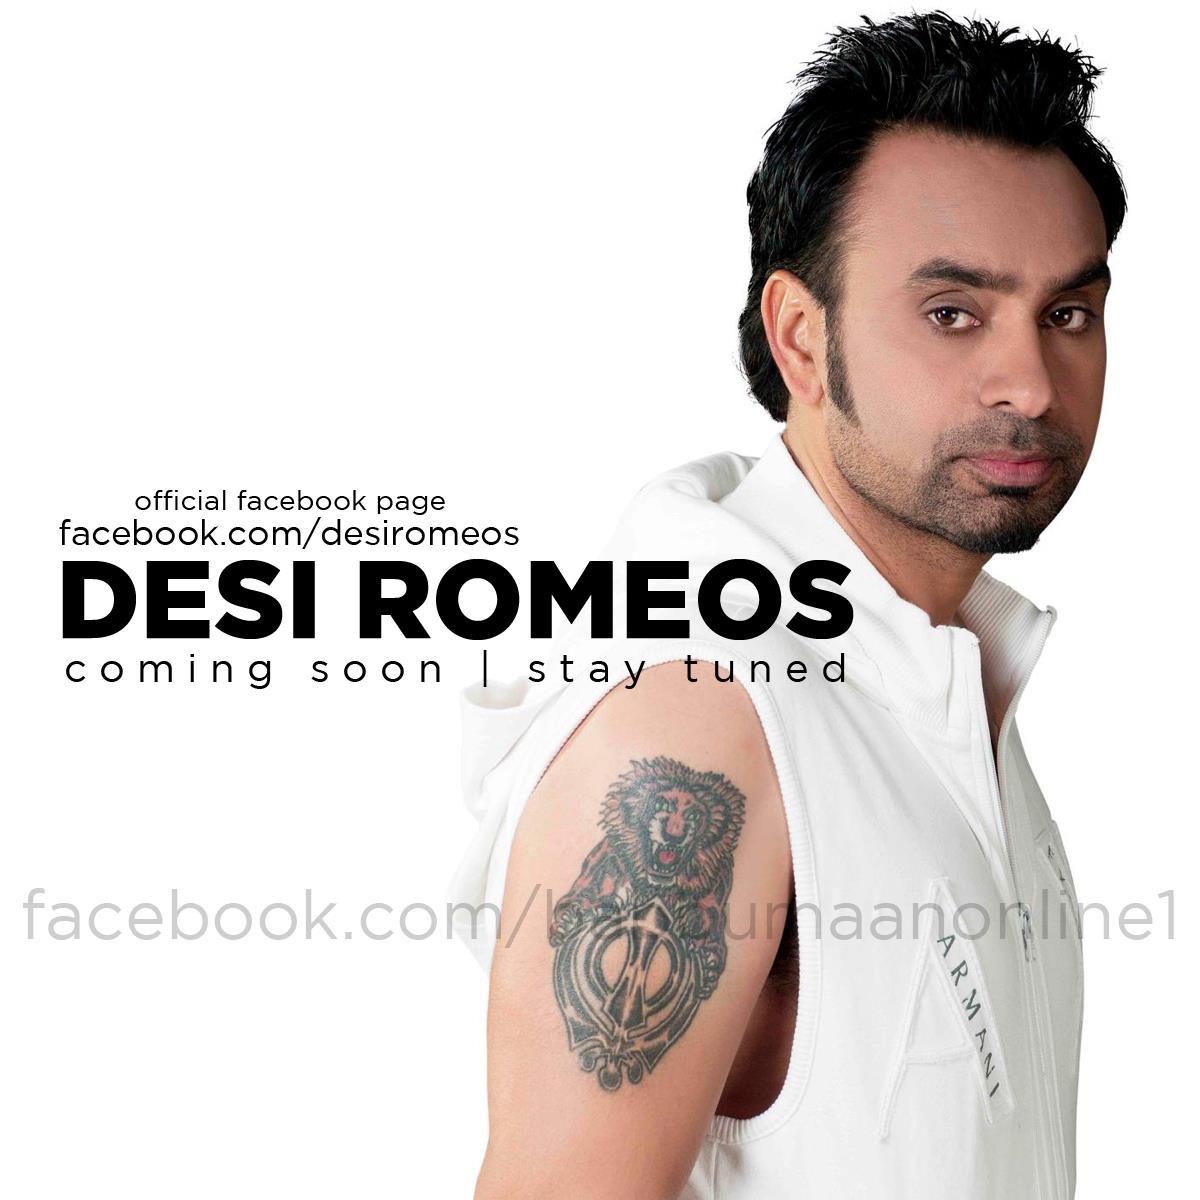 Desi romeo movie all songs / Angelika movie theater in